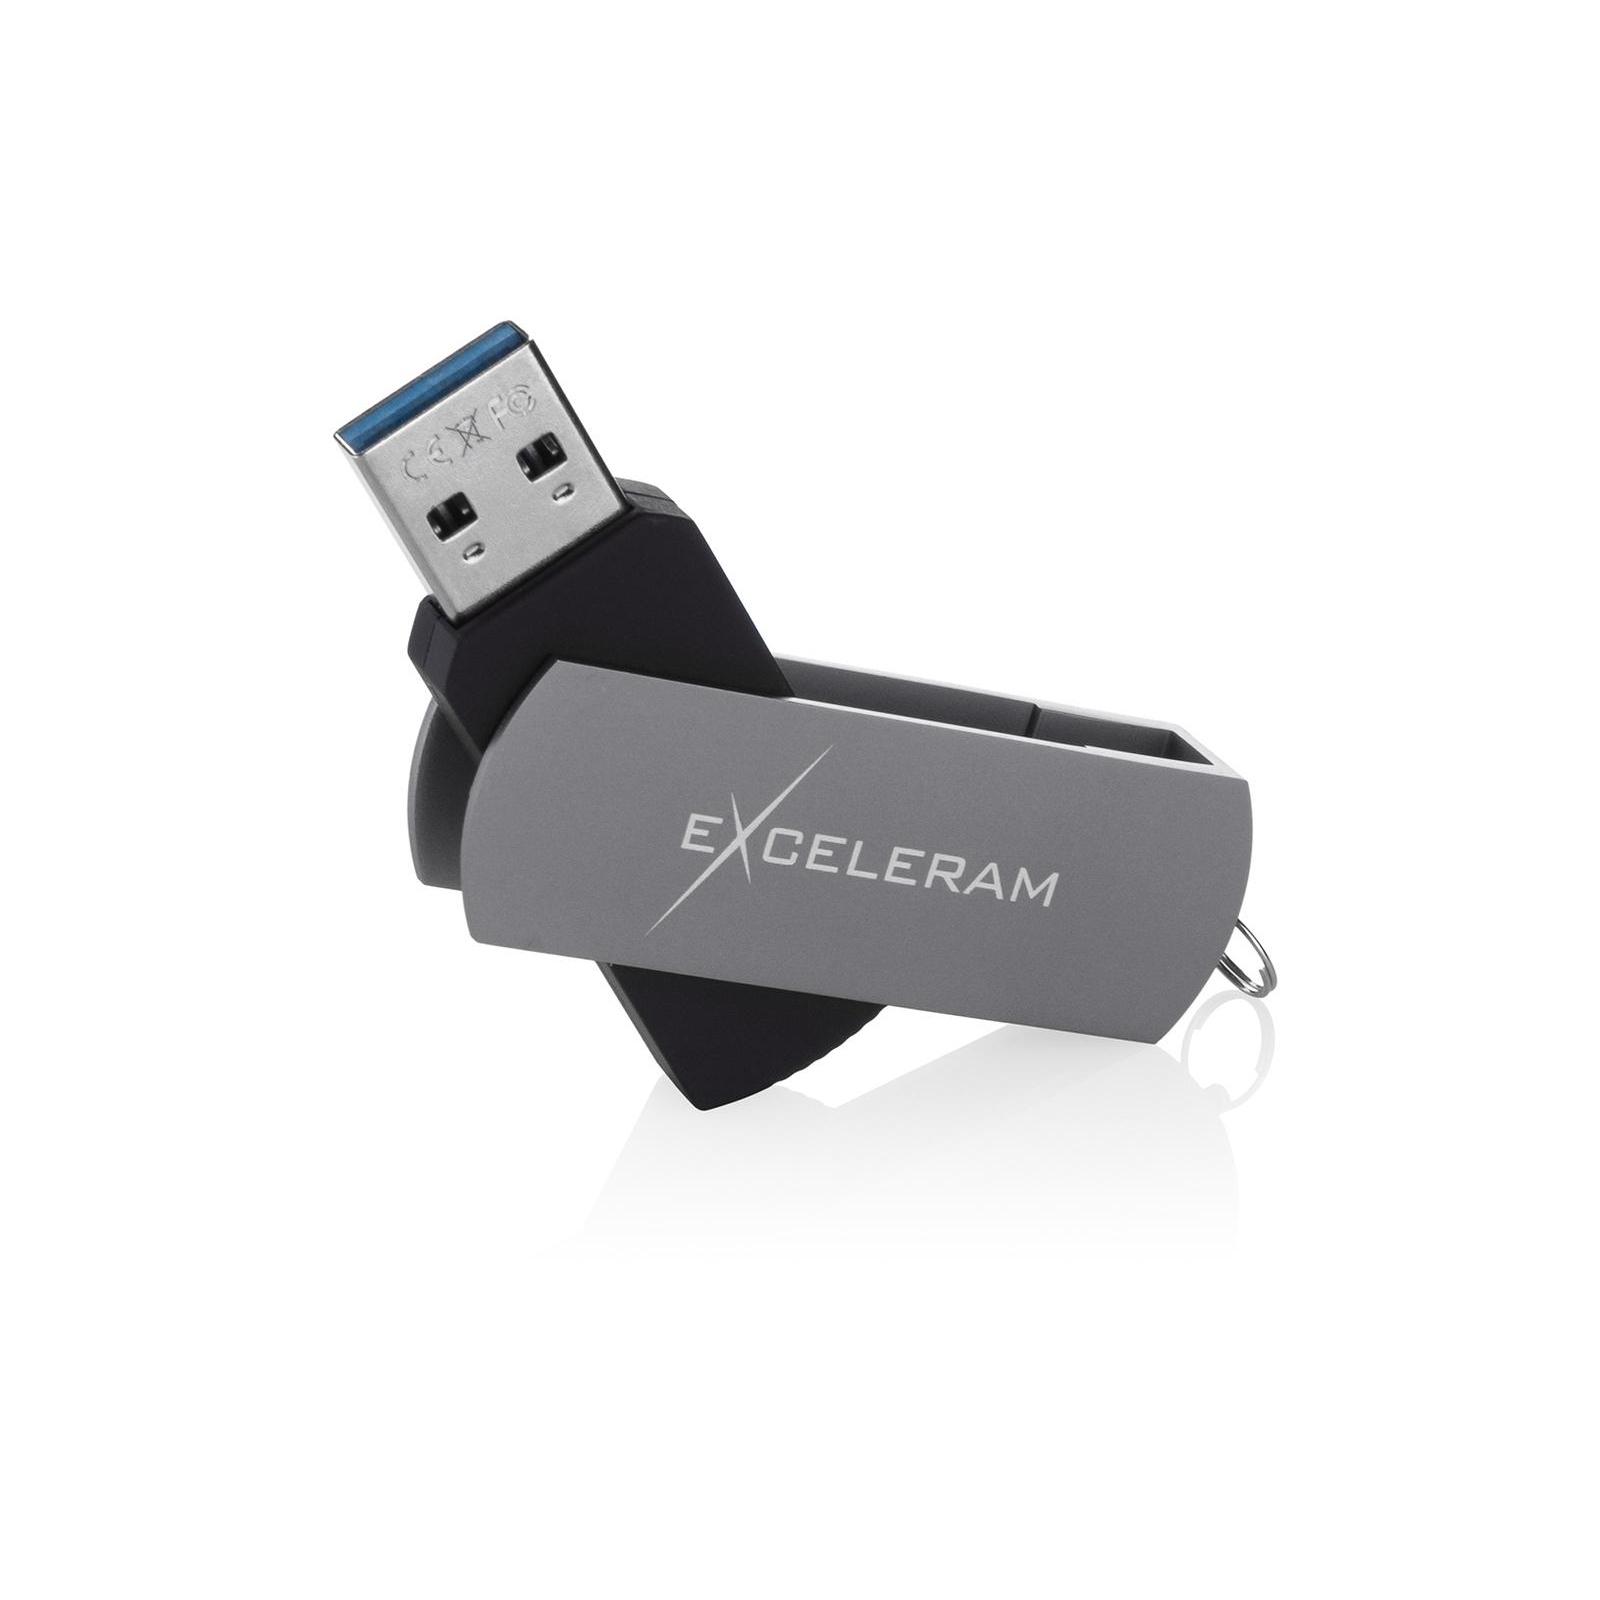 USB флеш накопитель eXceleram 128GB P2 Series Red/Black USB 3.1 Gen 1 (EXP2U3REB128) изображение 3